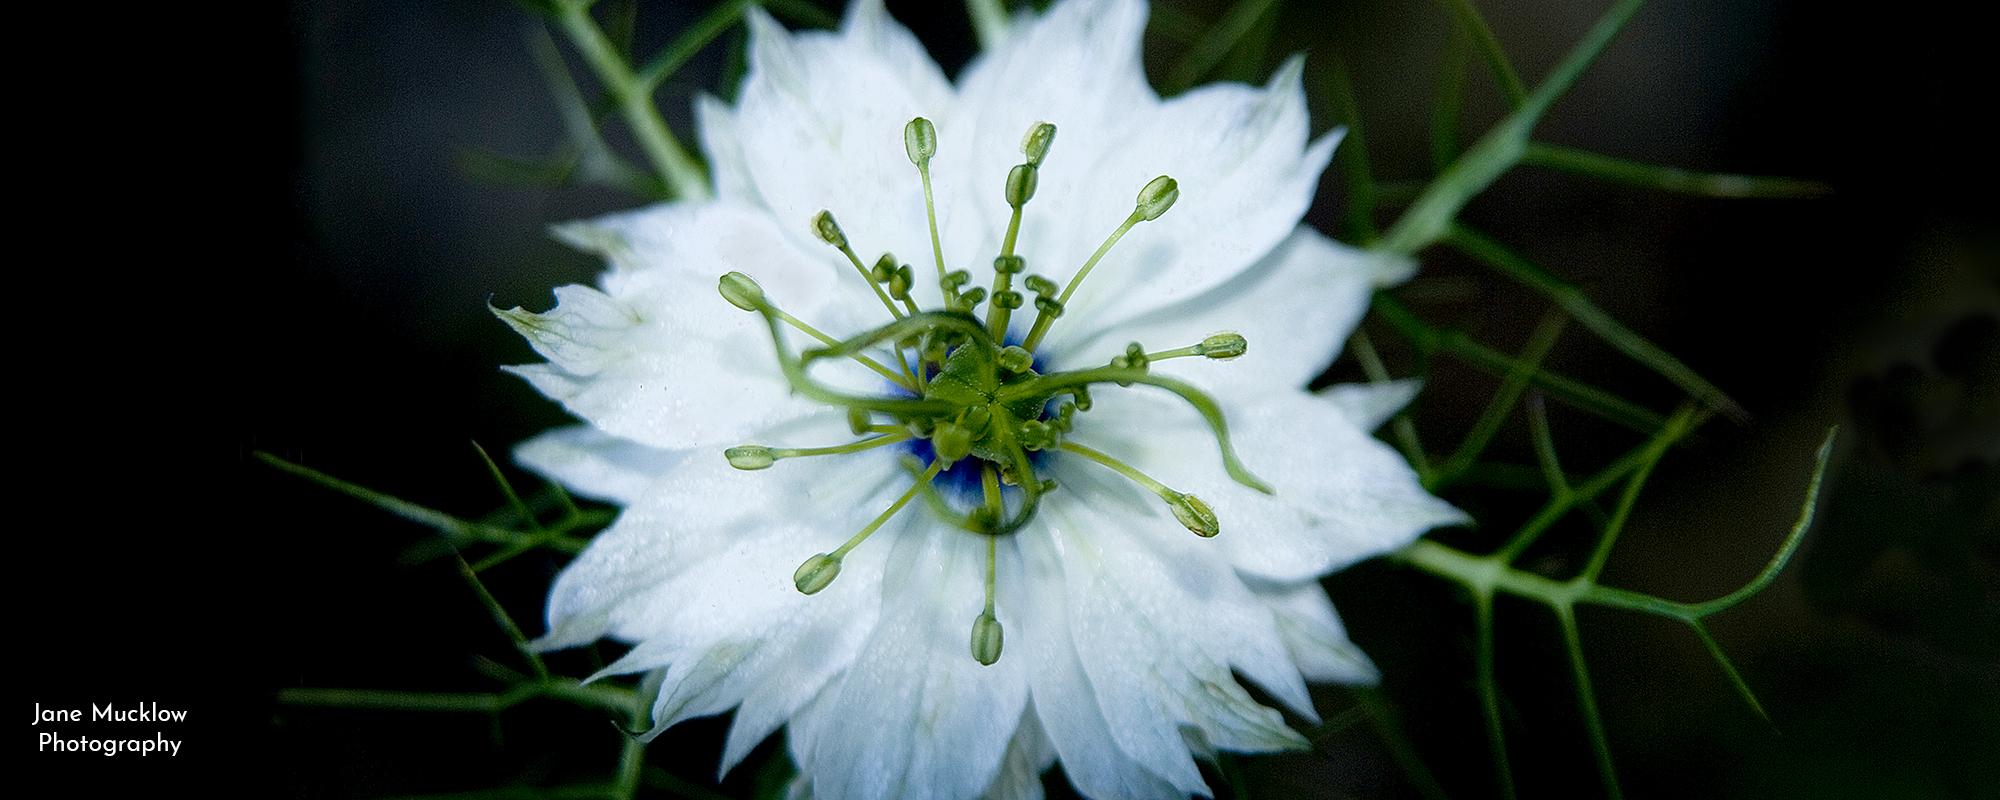 Photo by Jane Mucklow of a white Nigella, Love in a Mist flower